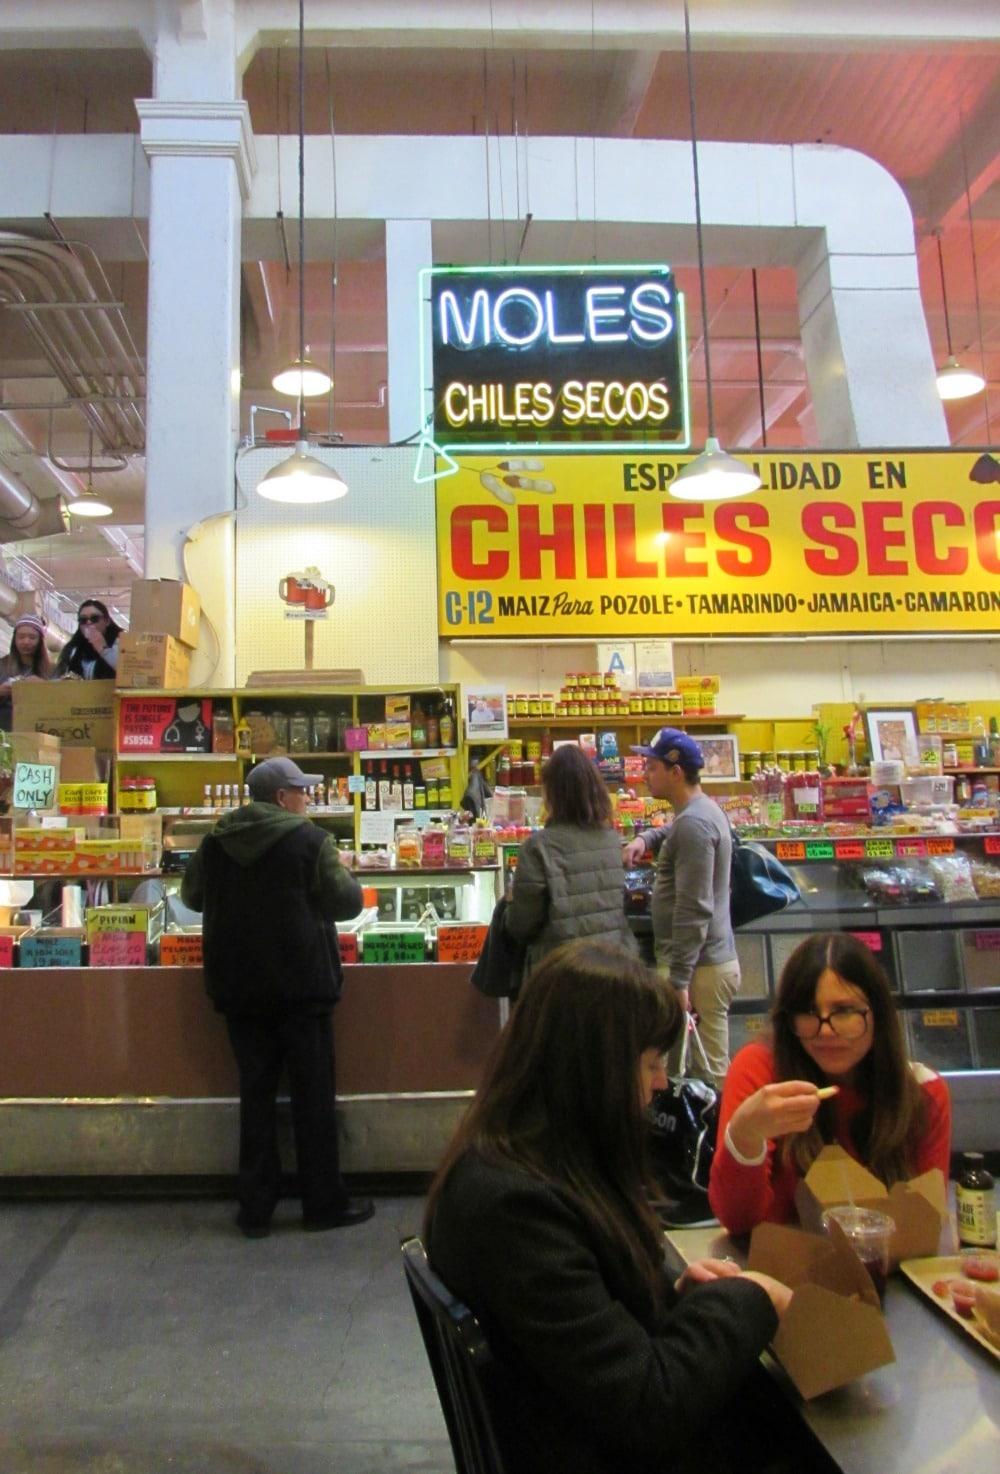 Boomer Travel | Los Angeles | Grand Central Market - Moles Chiles